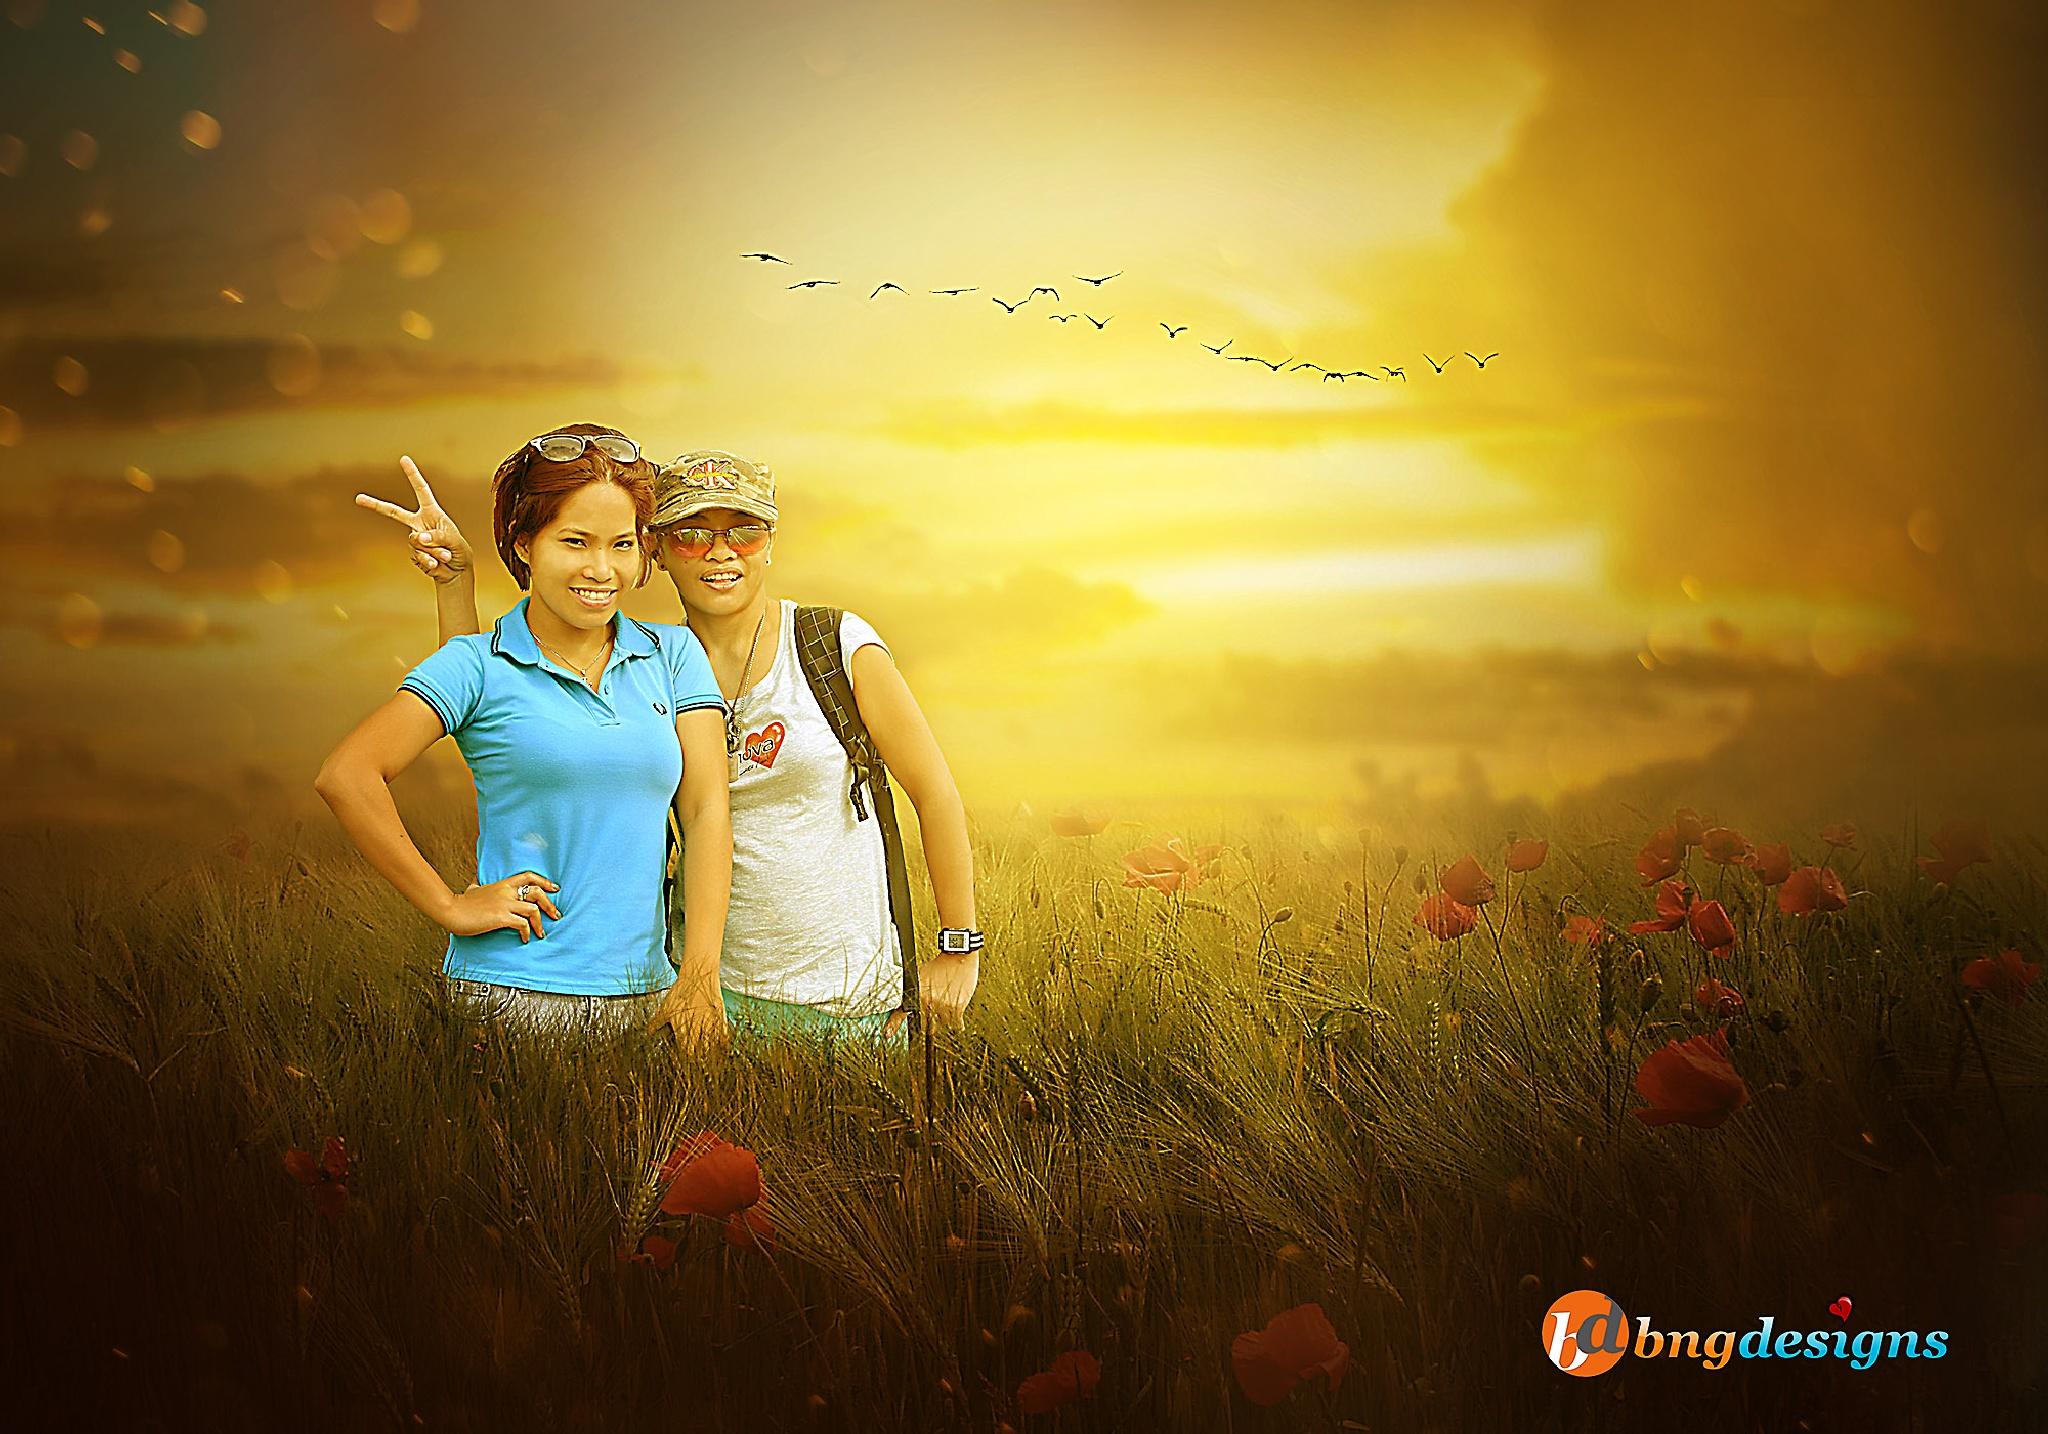 Photo Manipulation by Bing